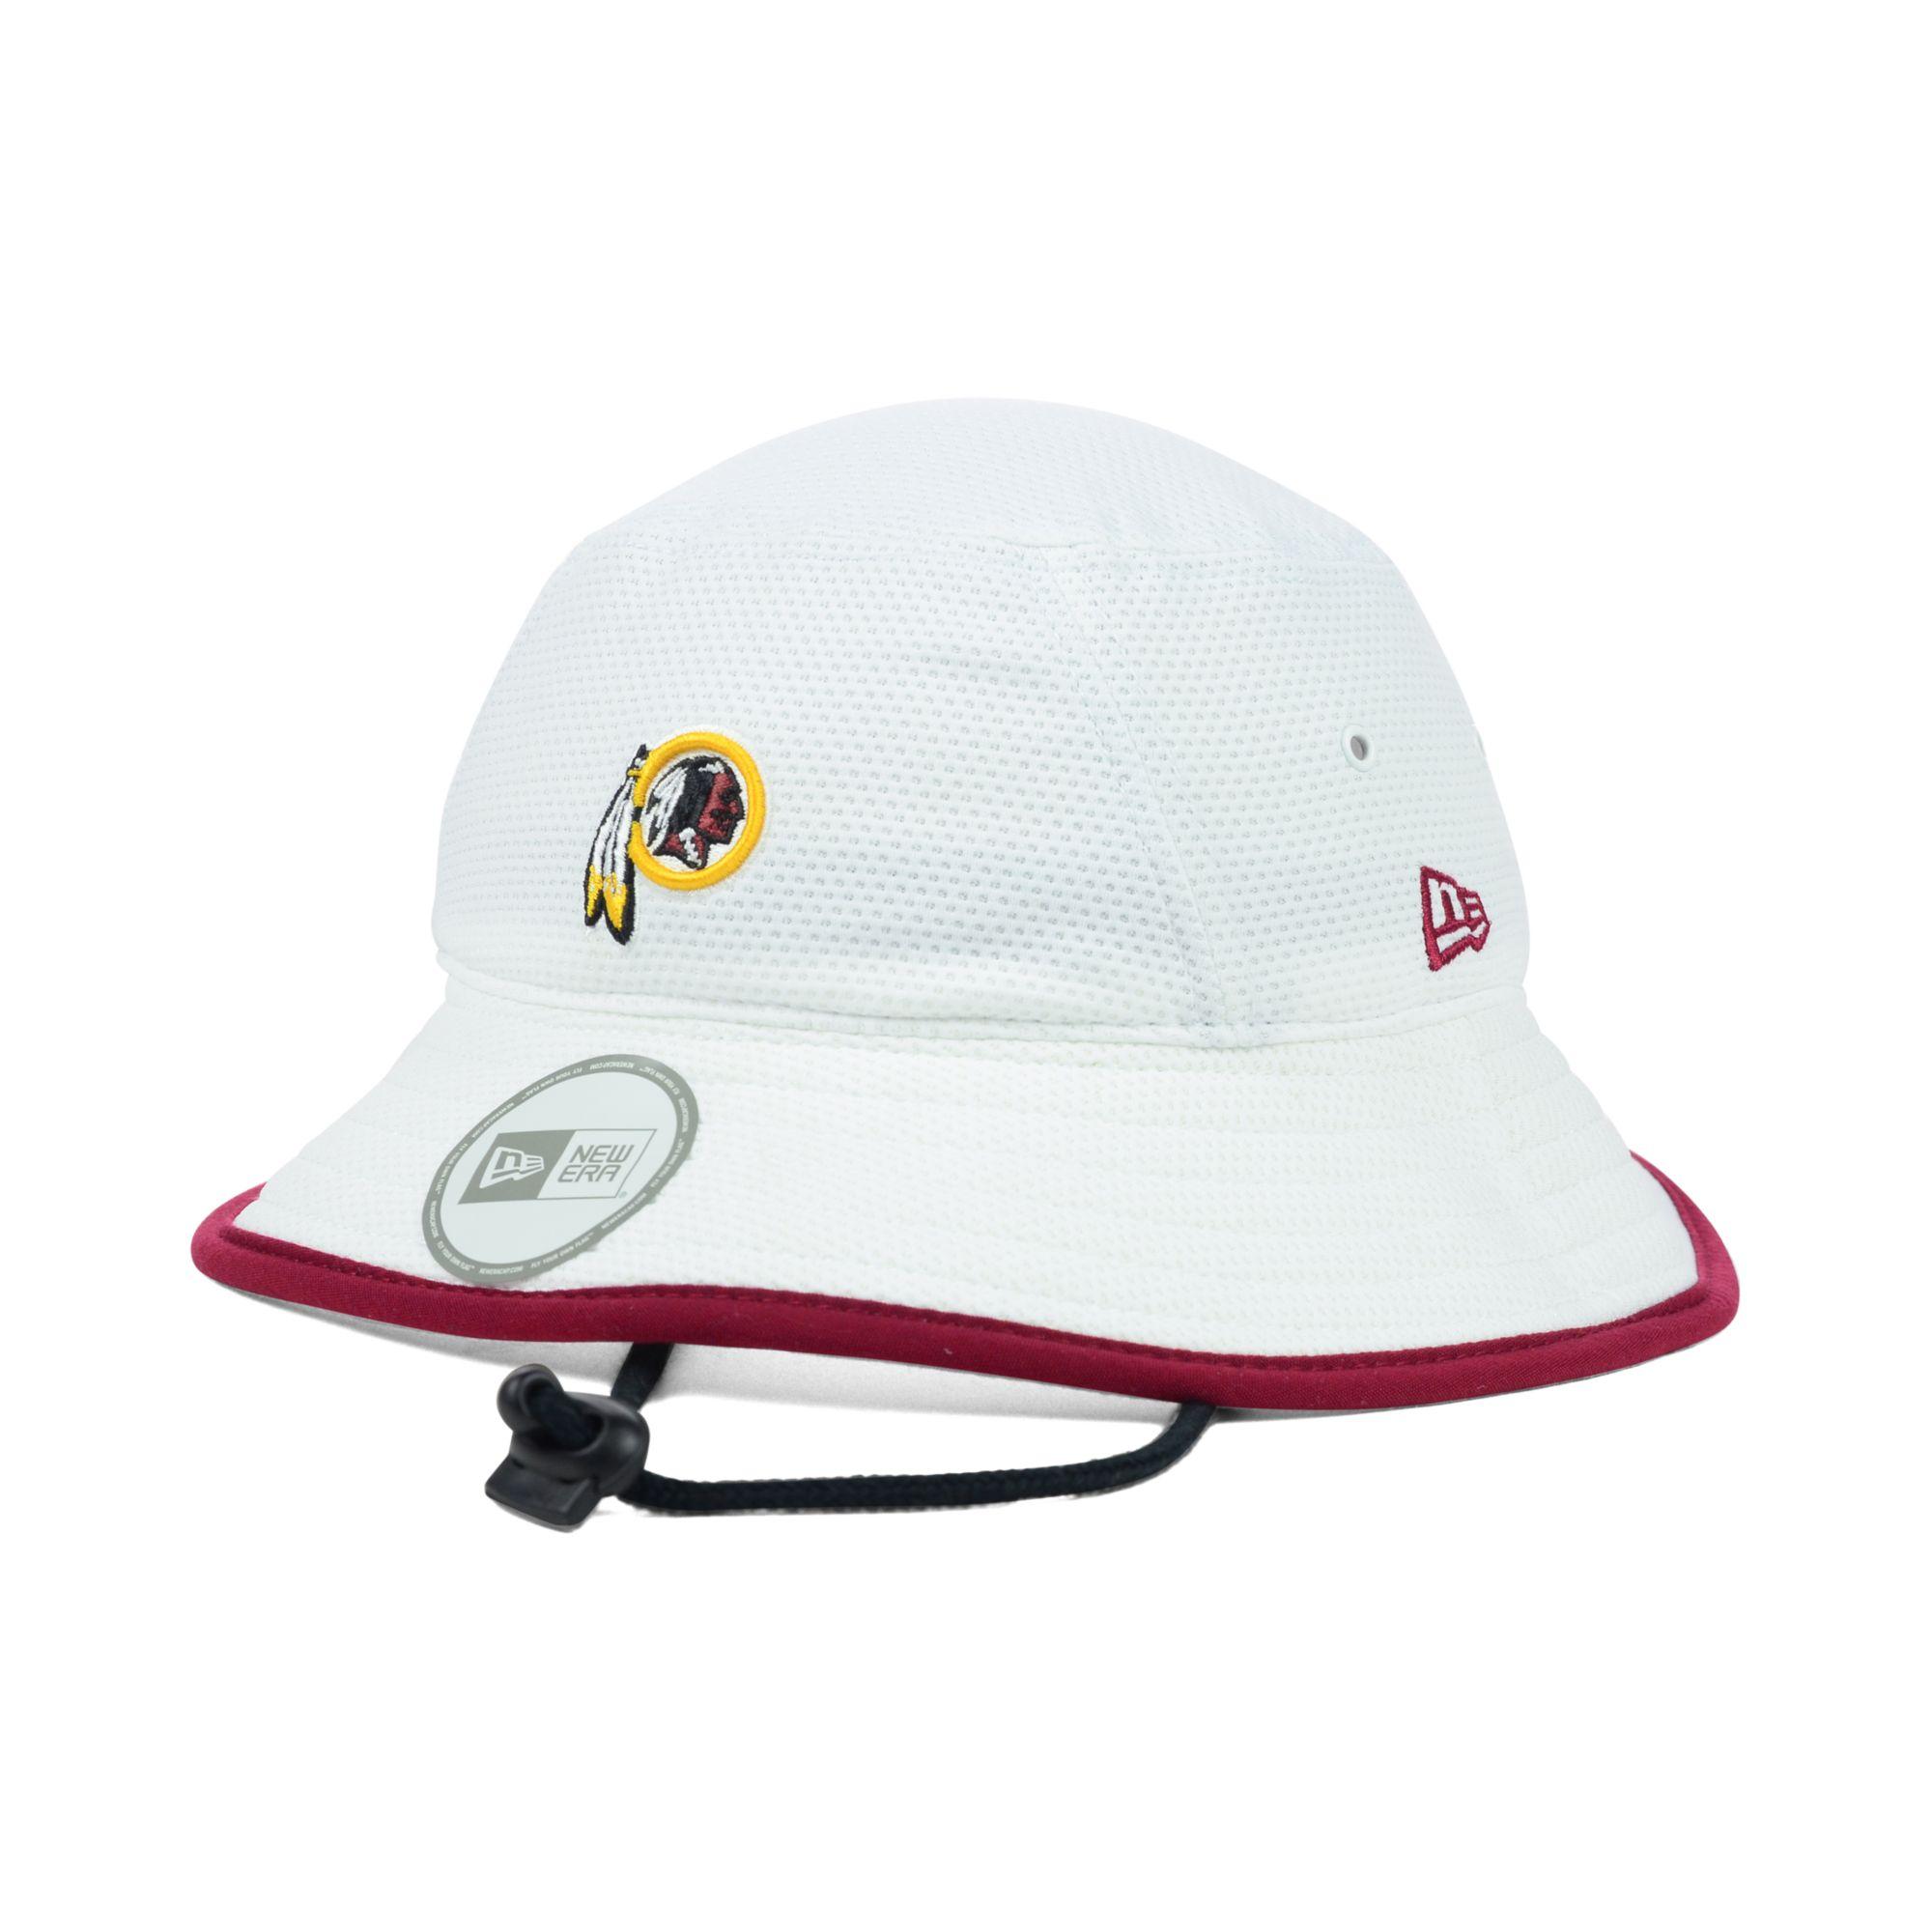 Lyst - KTZ Washington Redskins Training Camp Bucket Hat in White for Men 434d542a8